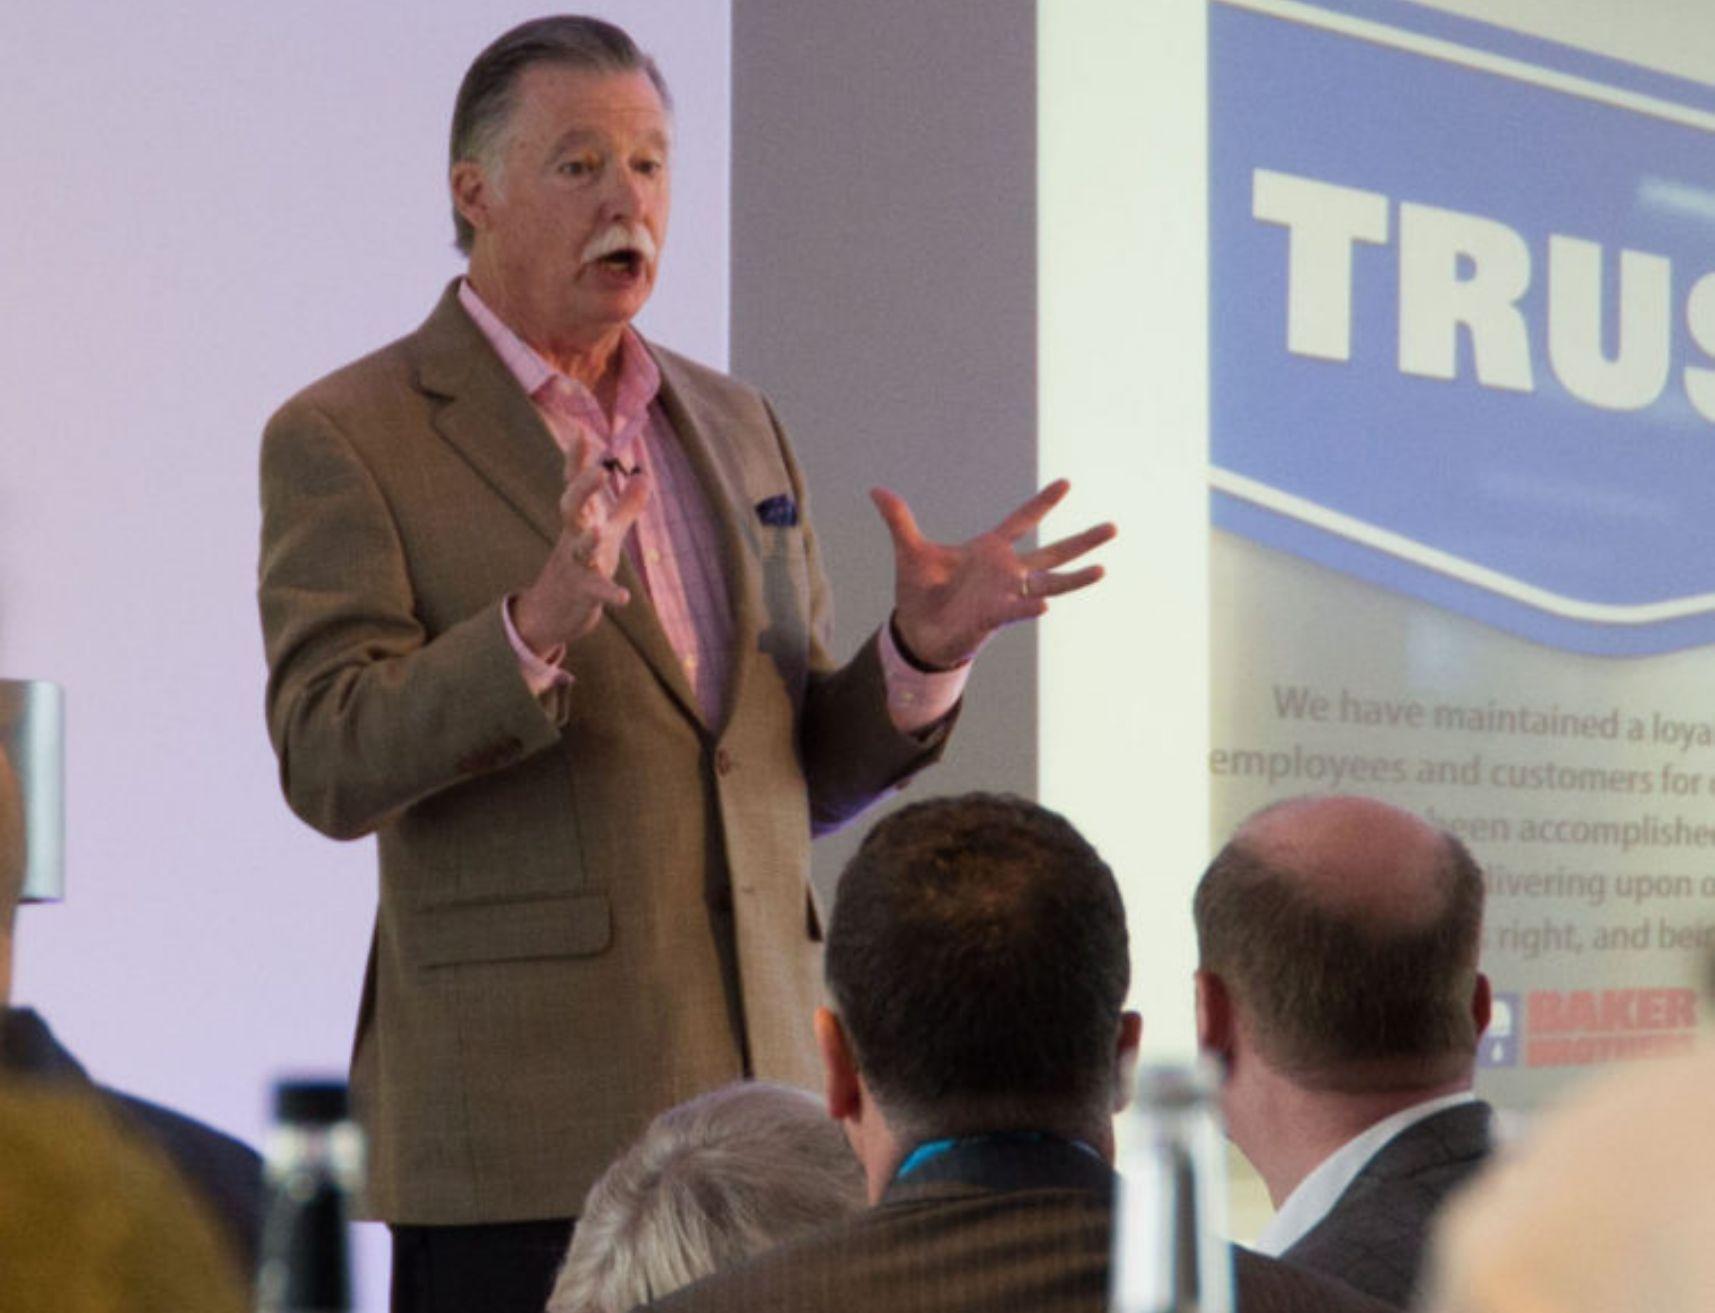 Greg Bustin Accountability Speaker